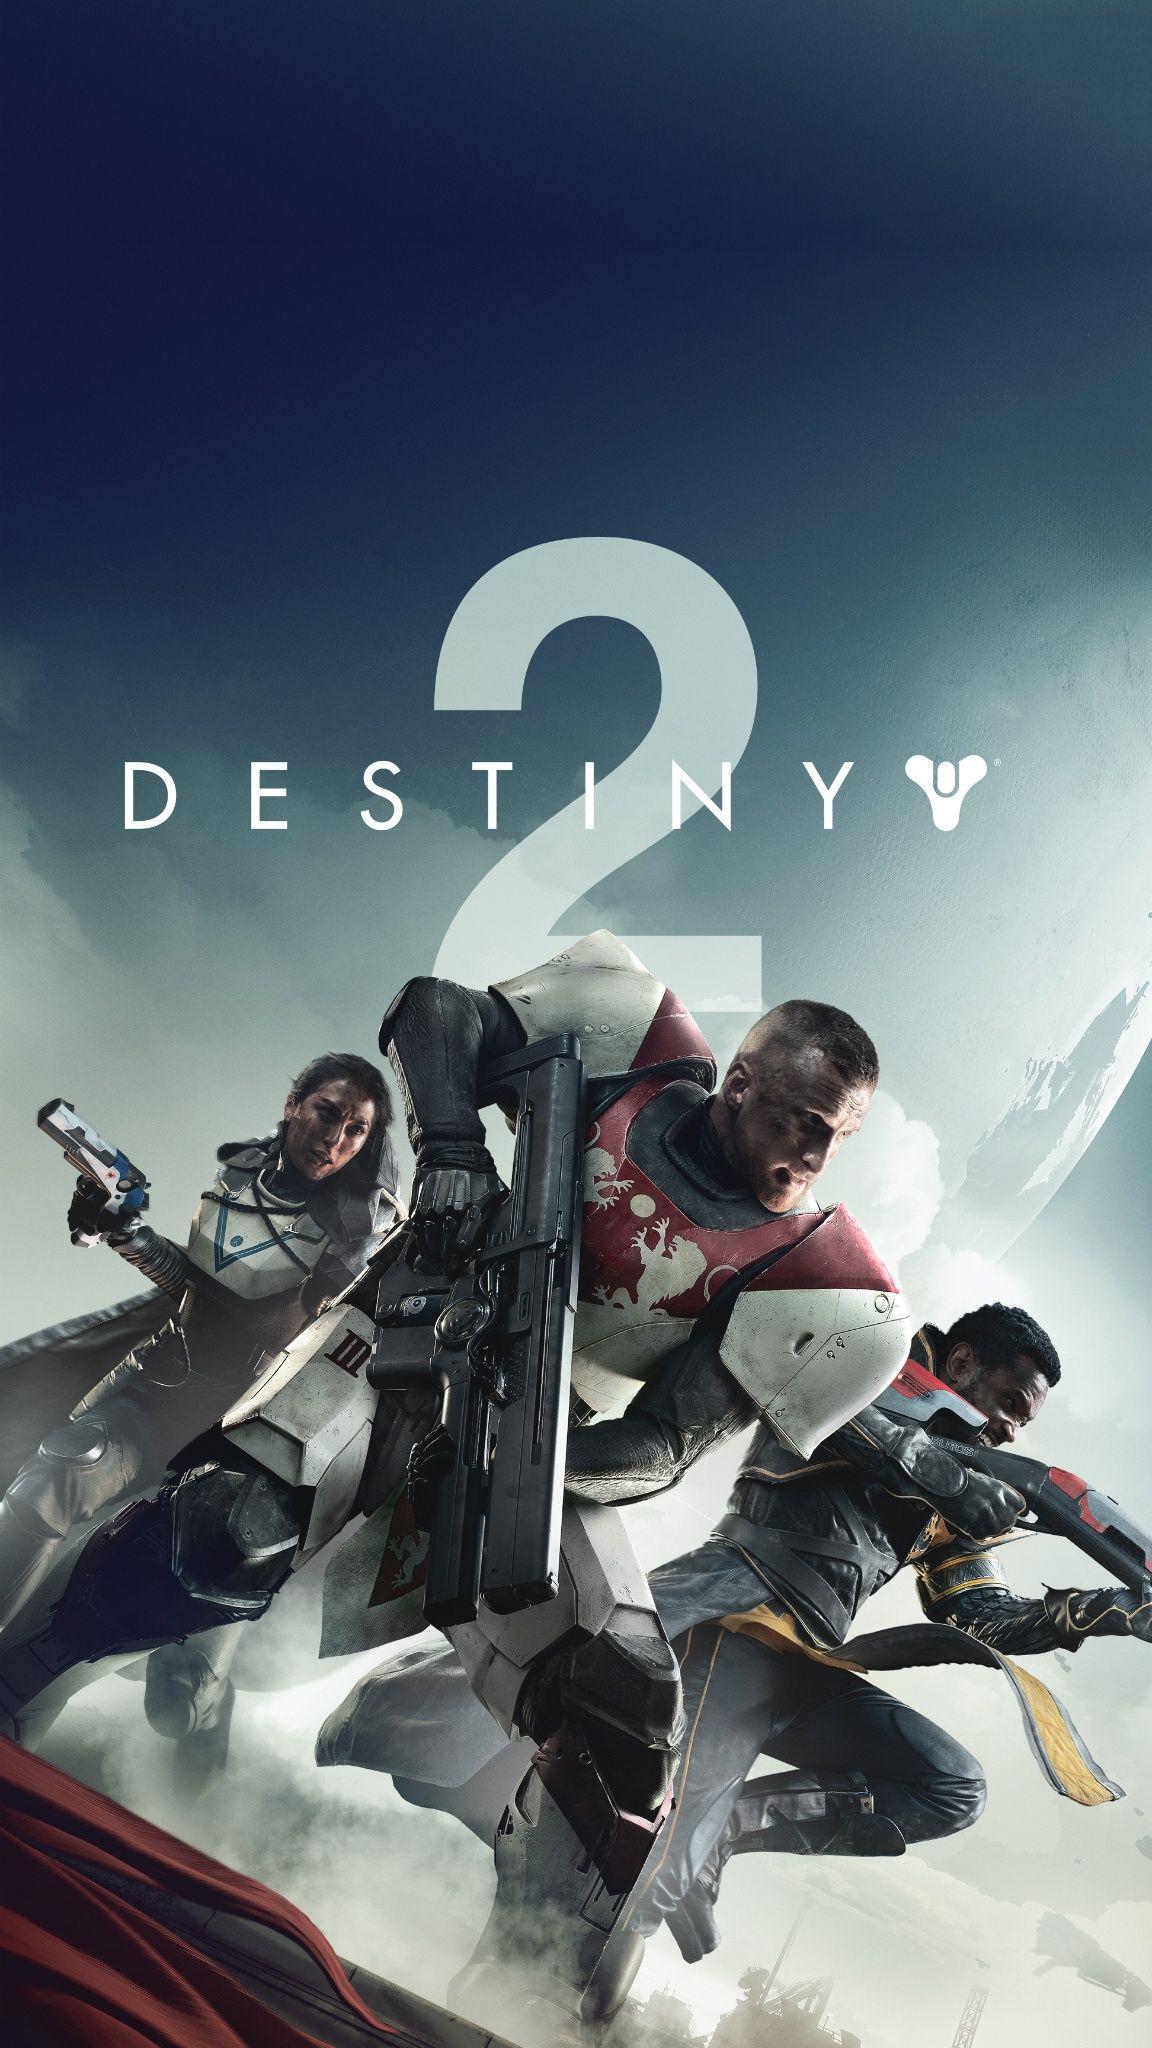 Destiny 2 Iphone Wallpaper Destiny 2 Iphone Background